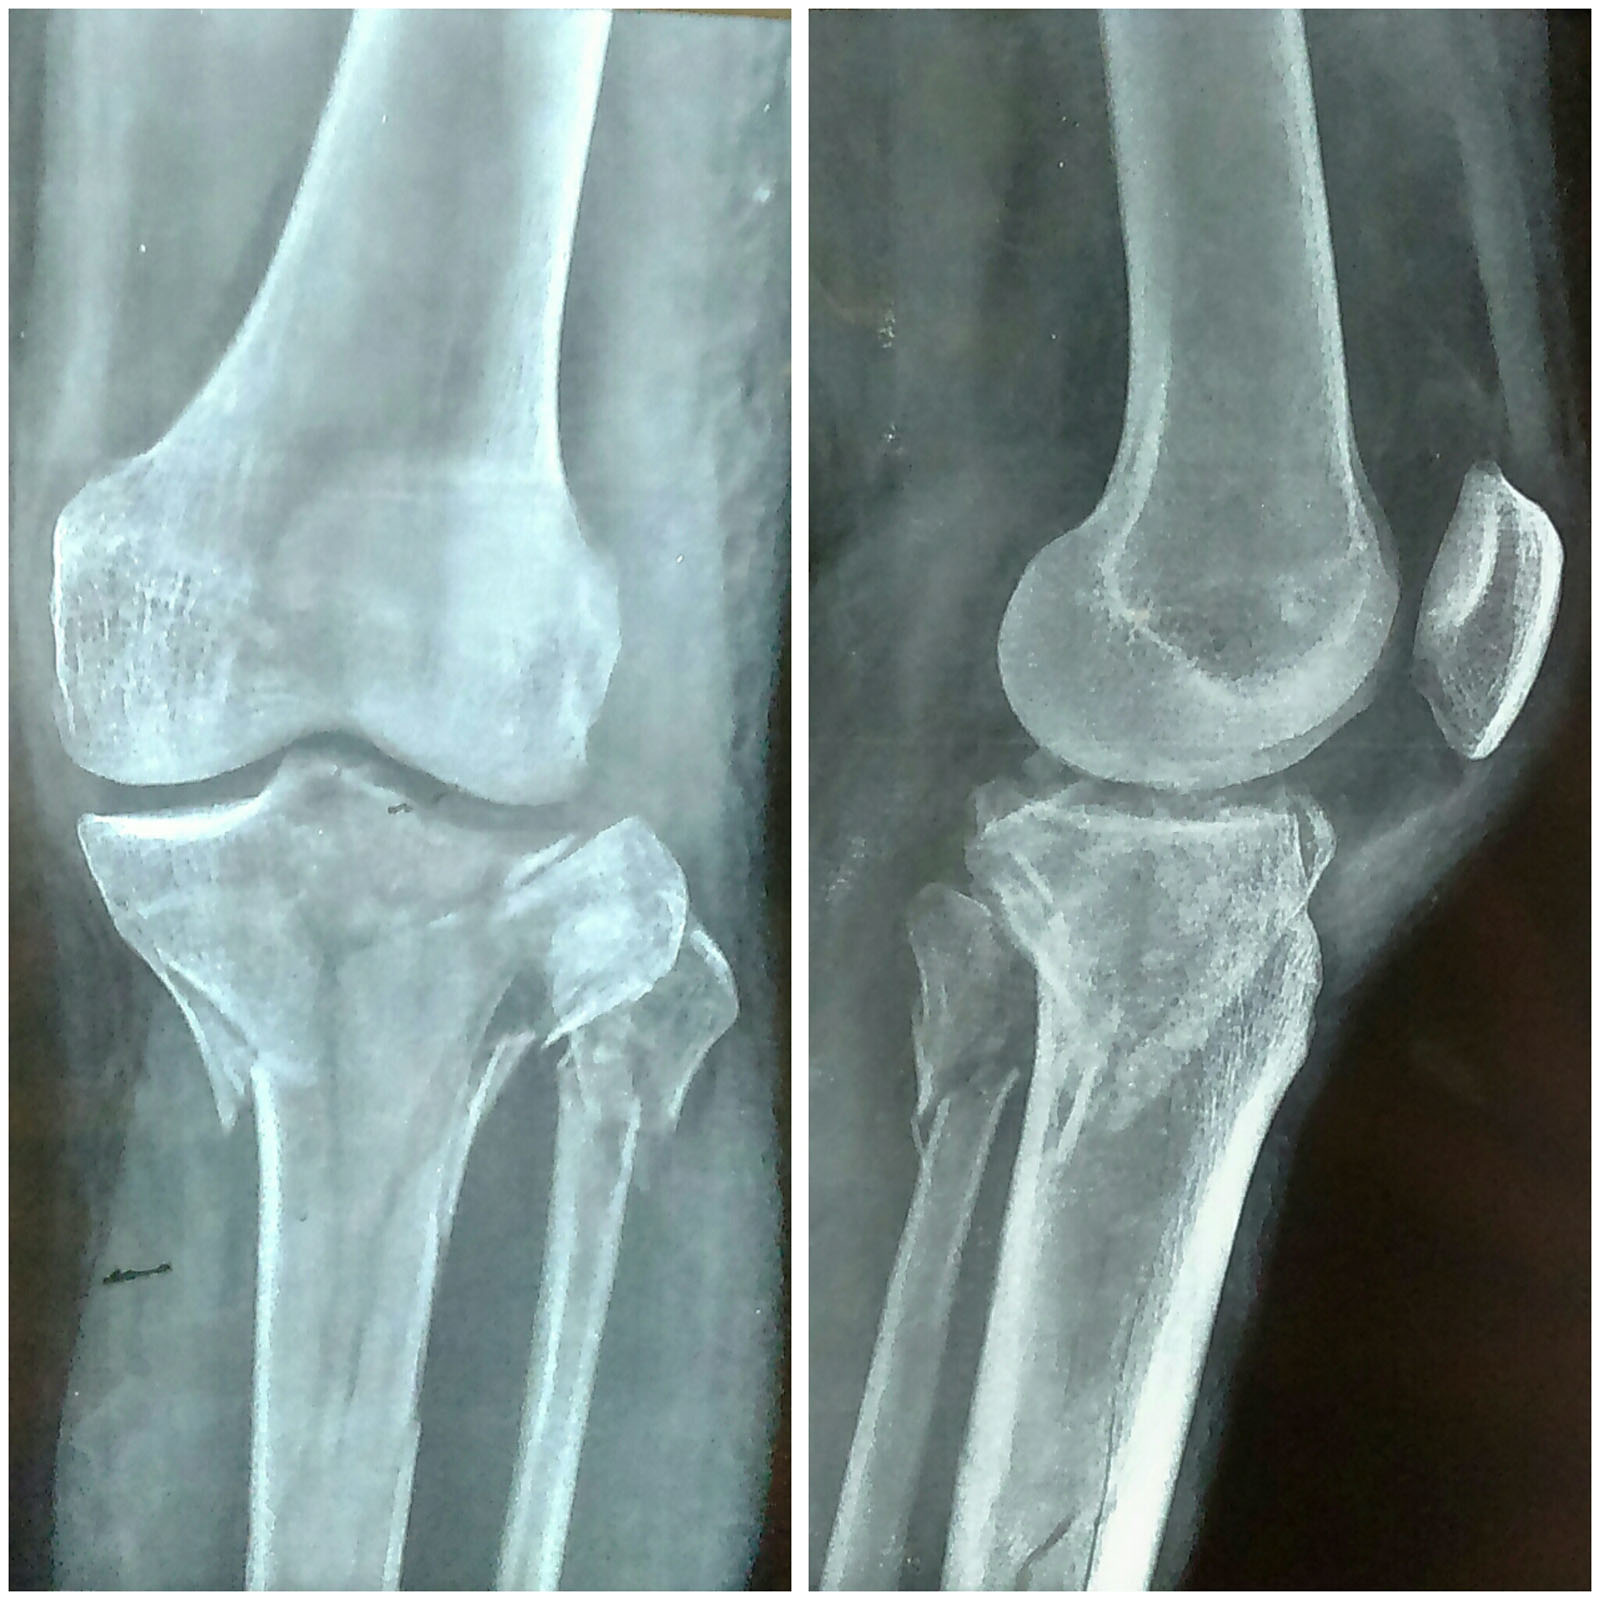 Cureus | Minimally Invasive Treatment of a Complex Tibial Plateau ...